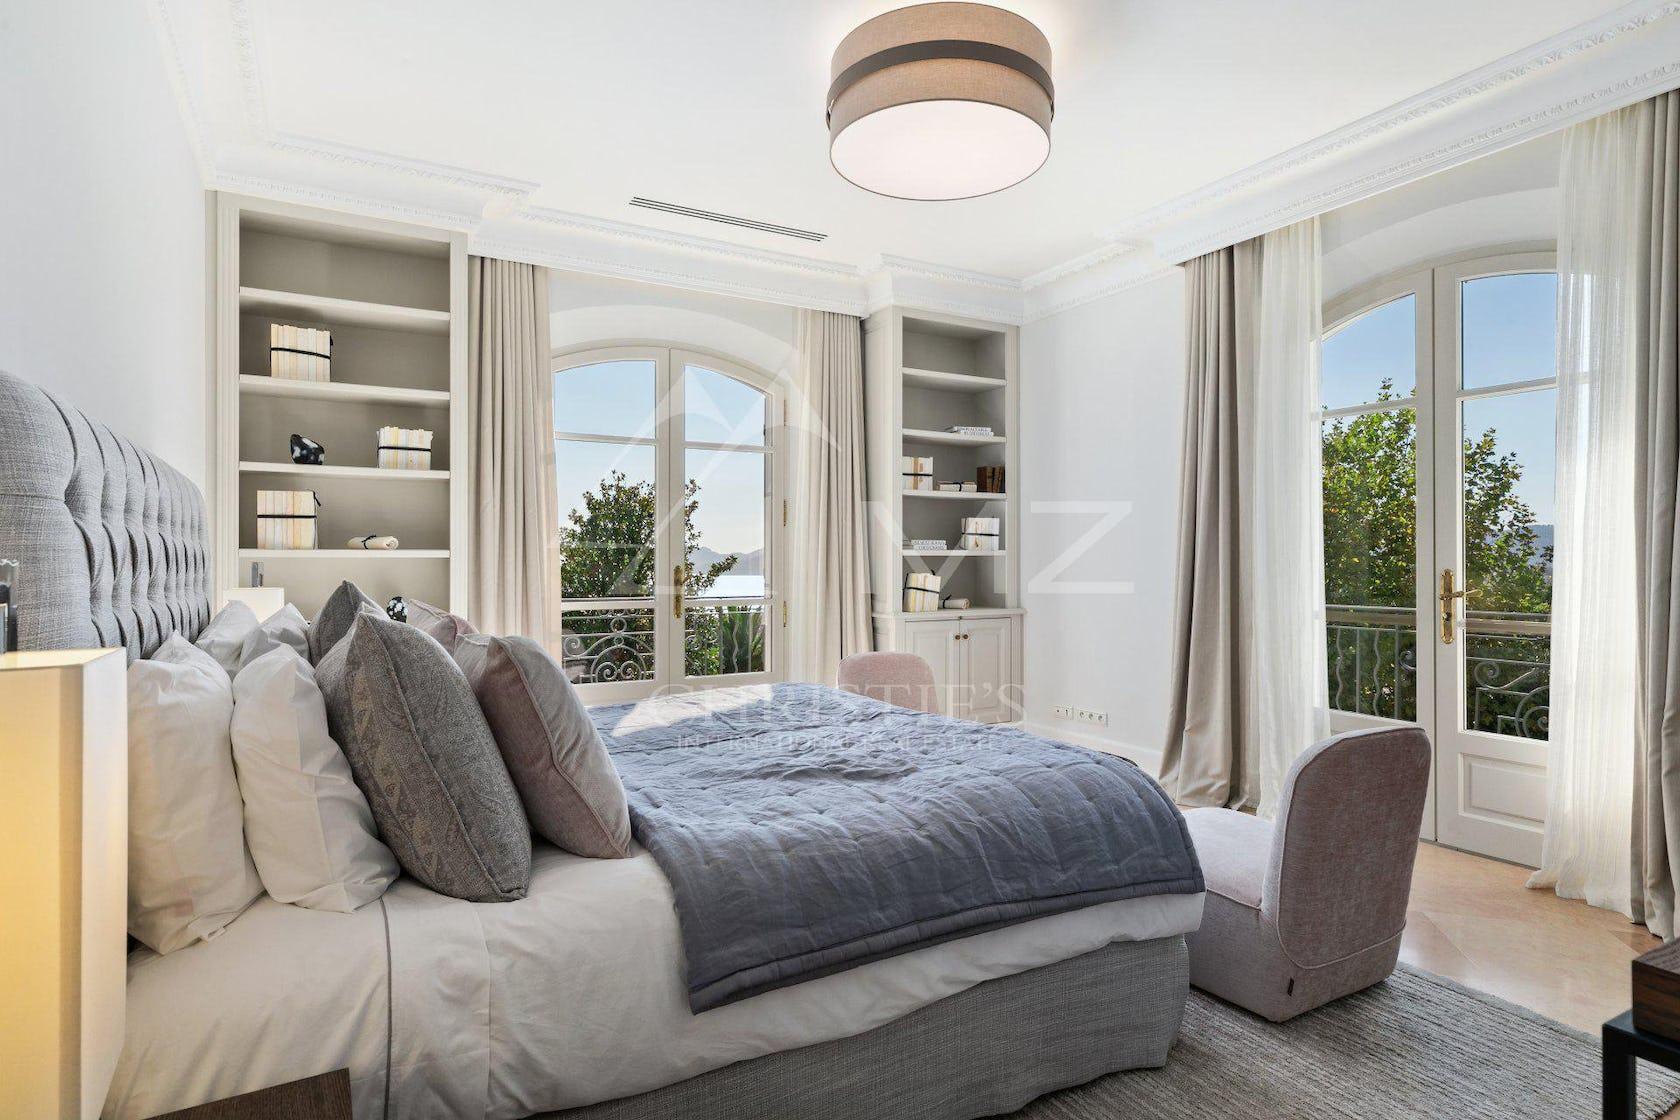 furniture bedroom room indoors interior design living room bed